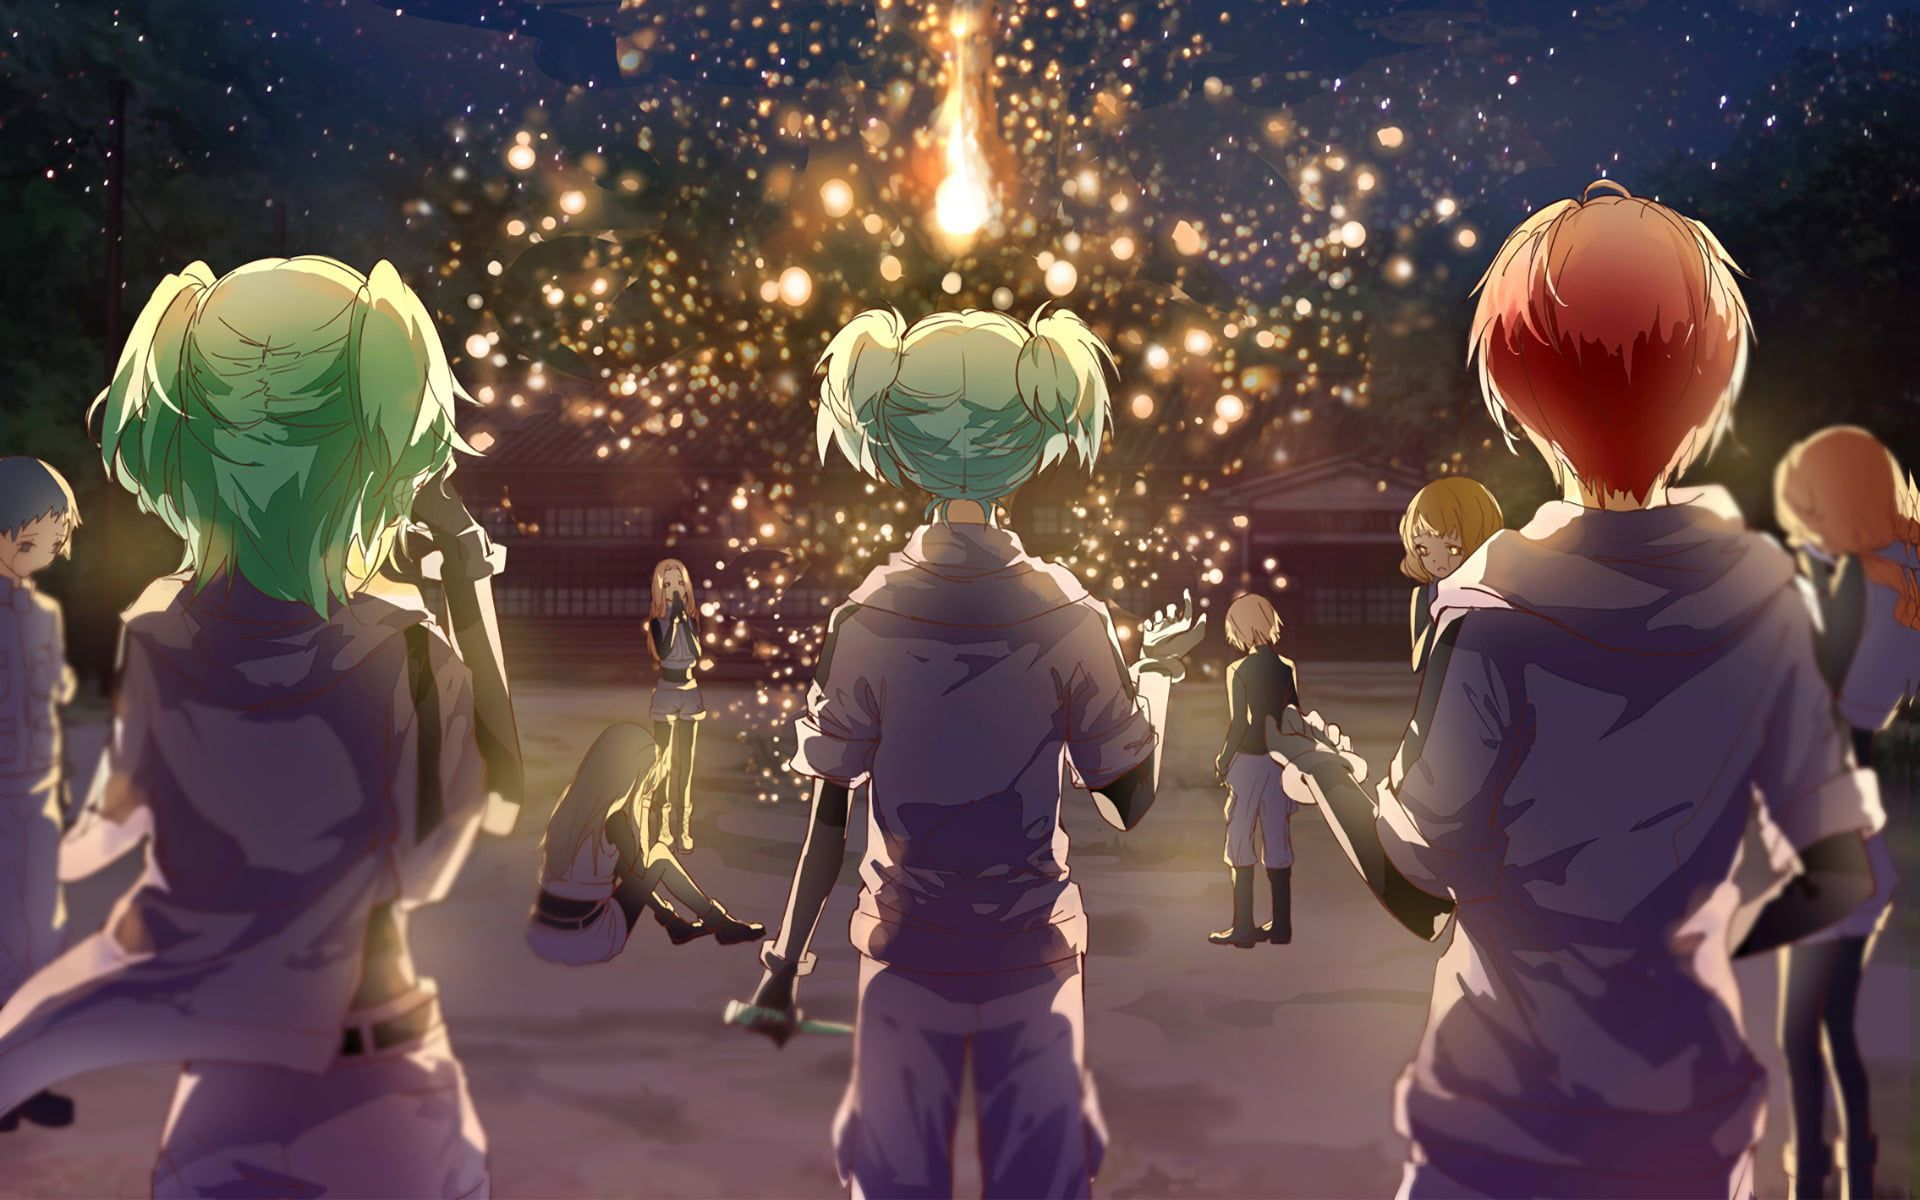 Hd Wallpaper Anime Digital Wallpaper Assassination Classroom Hinano Kurahashi